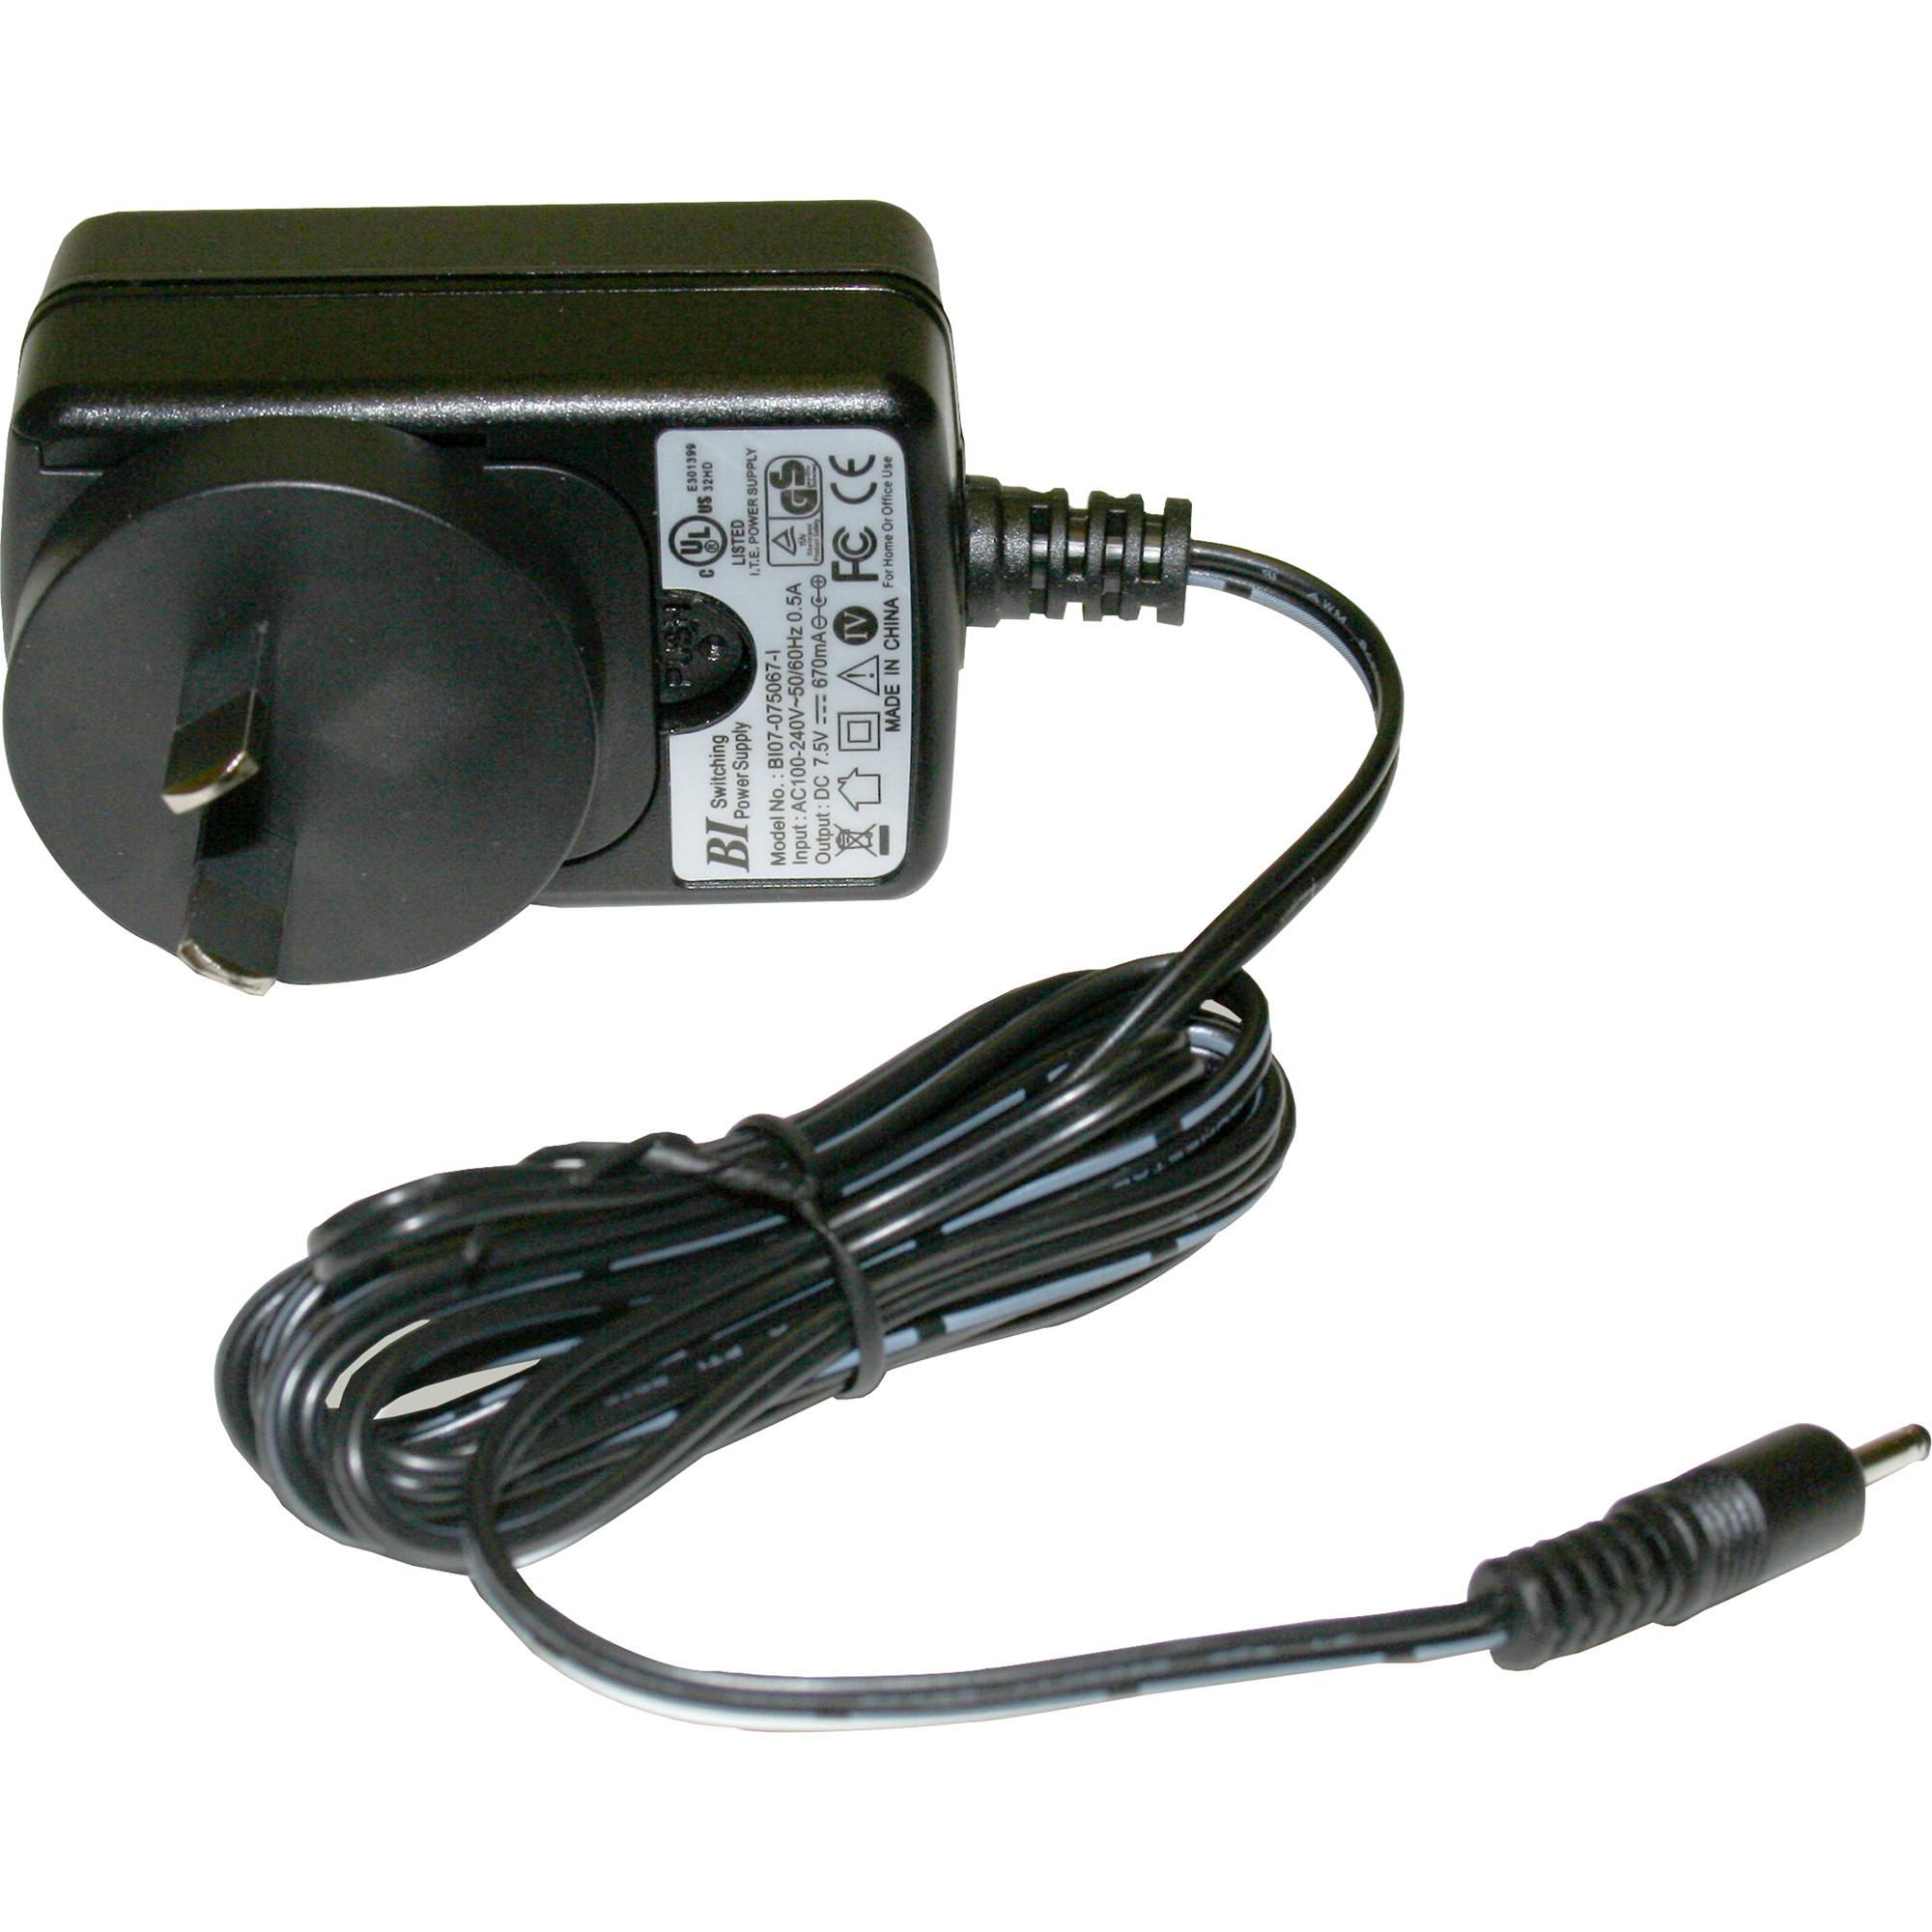 listen technologies la 208 01 7 5 vdc power charging la 208 01